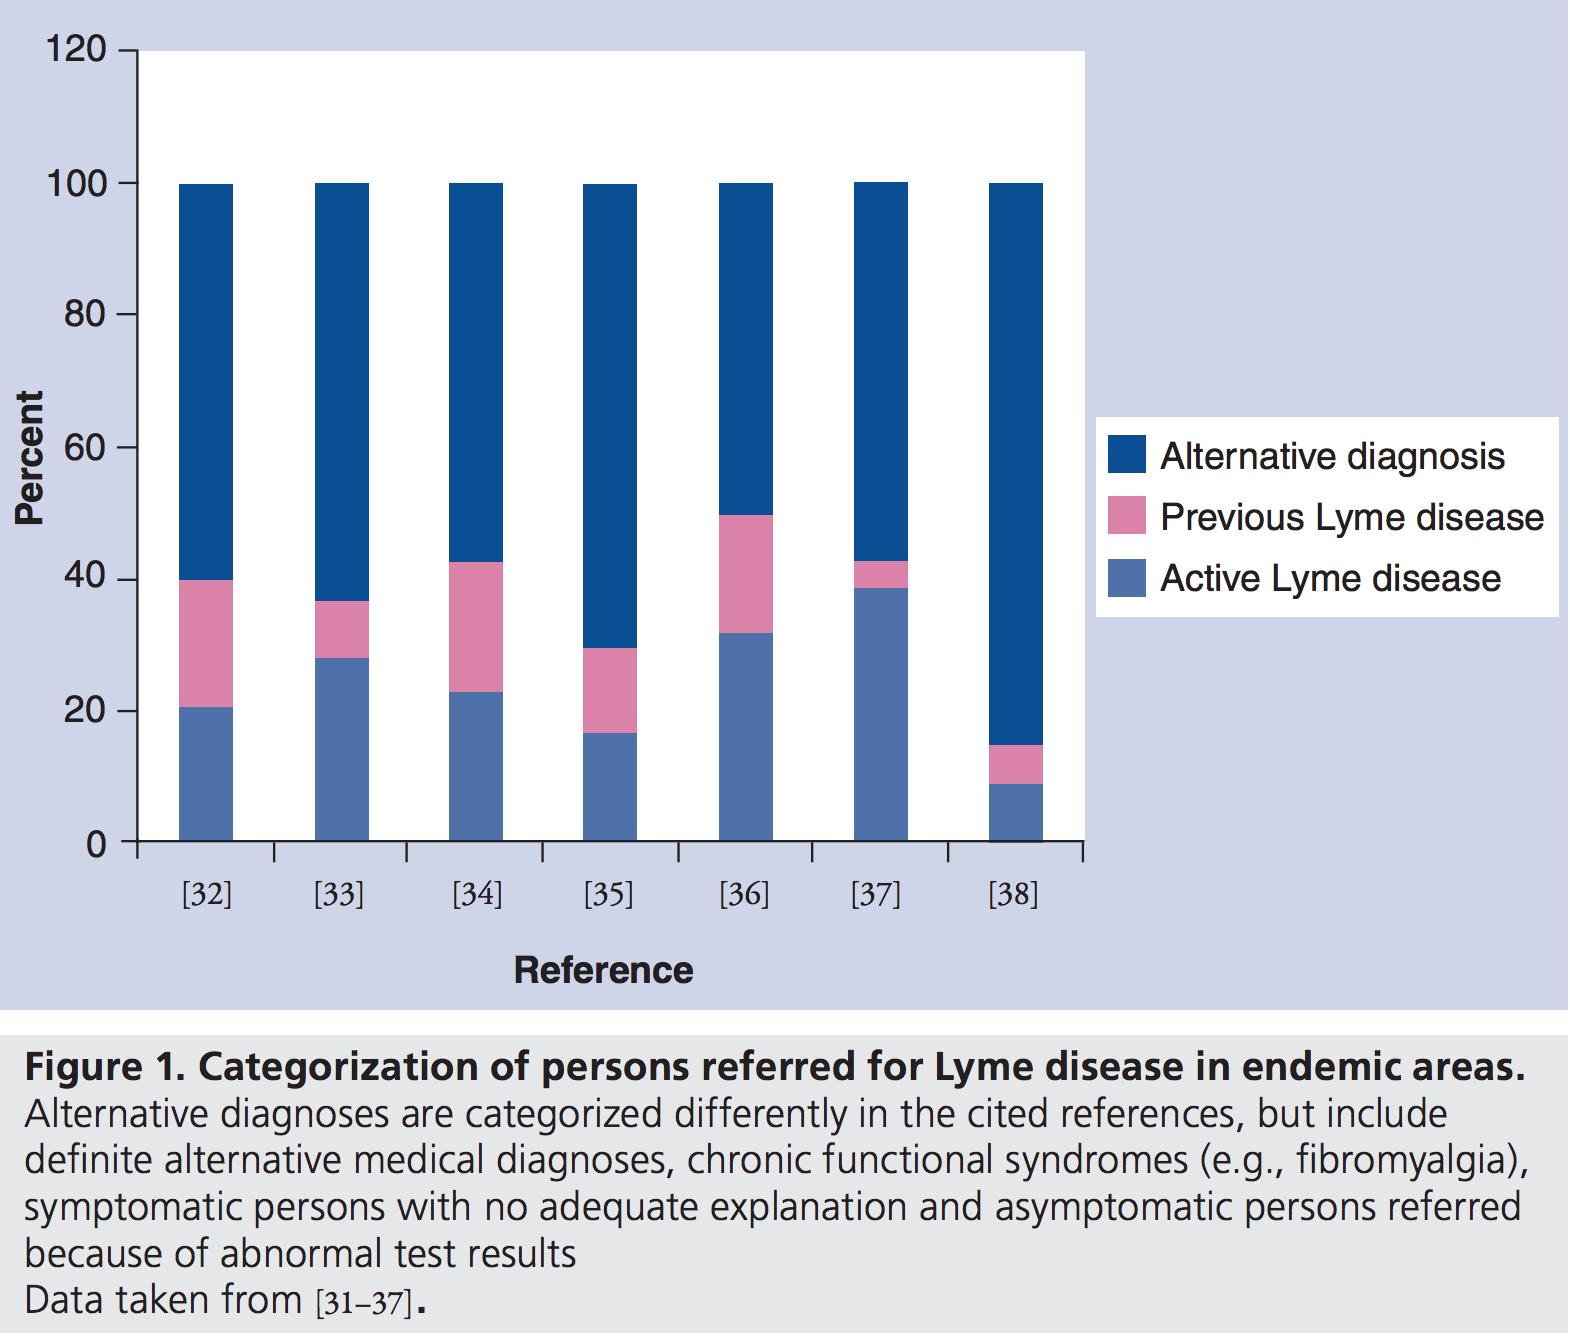 Lyme Misdiagnosis: A Serious Problem